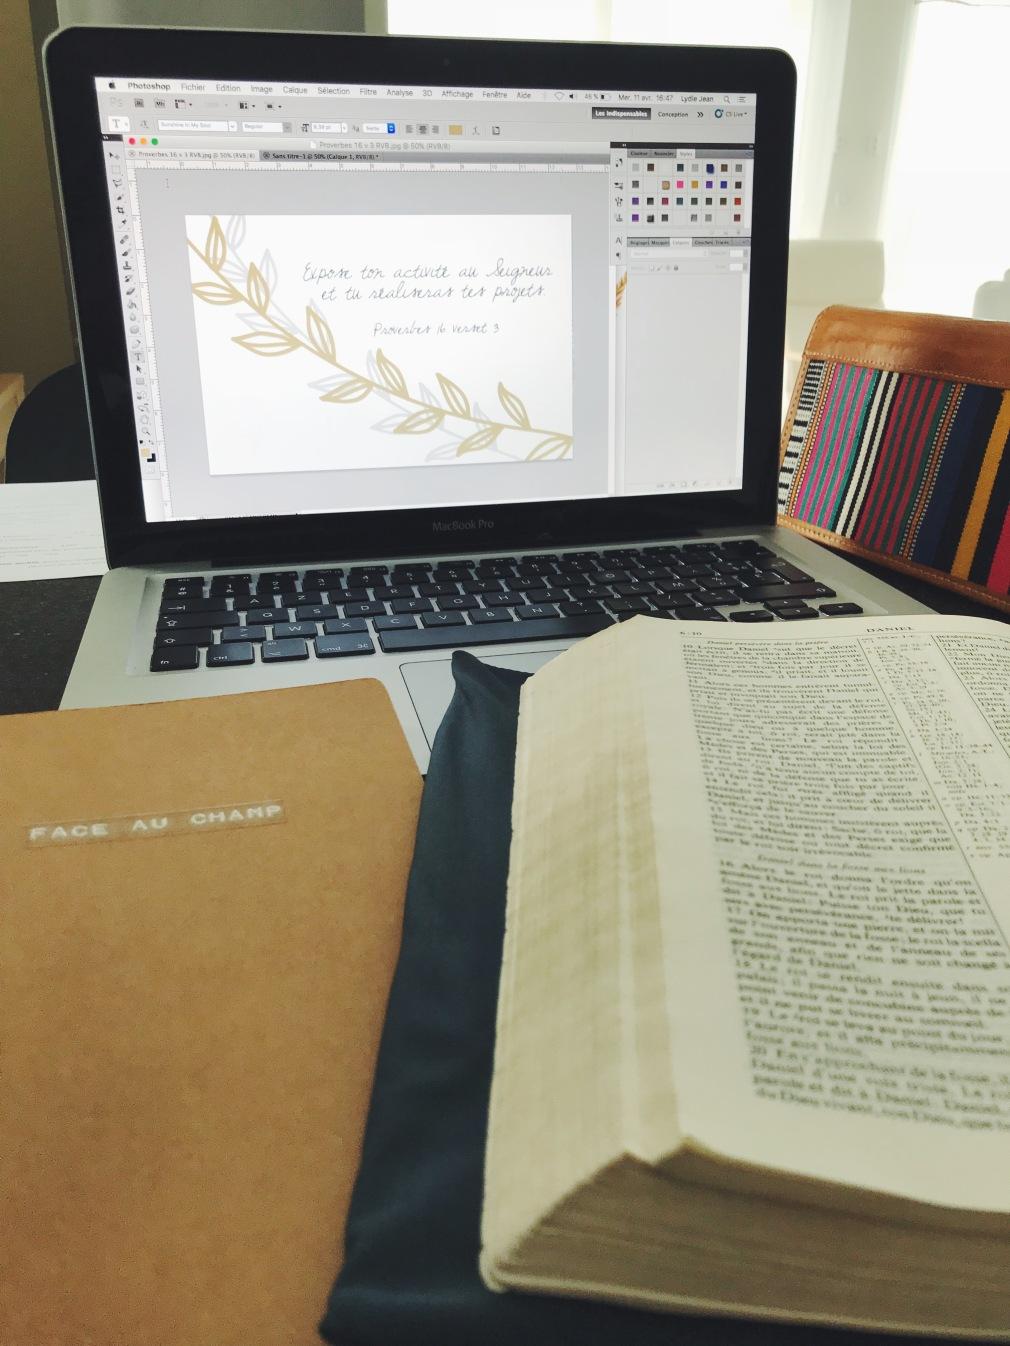 Face au champ blog ordinateur work in progress bible verset carte verset